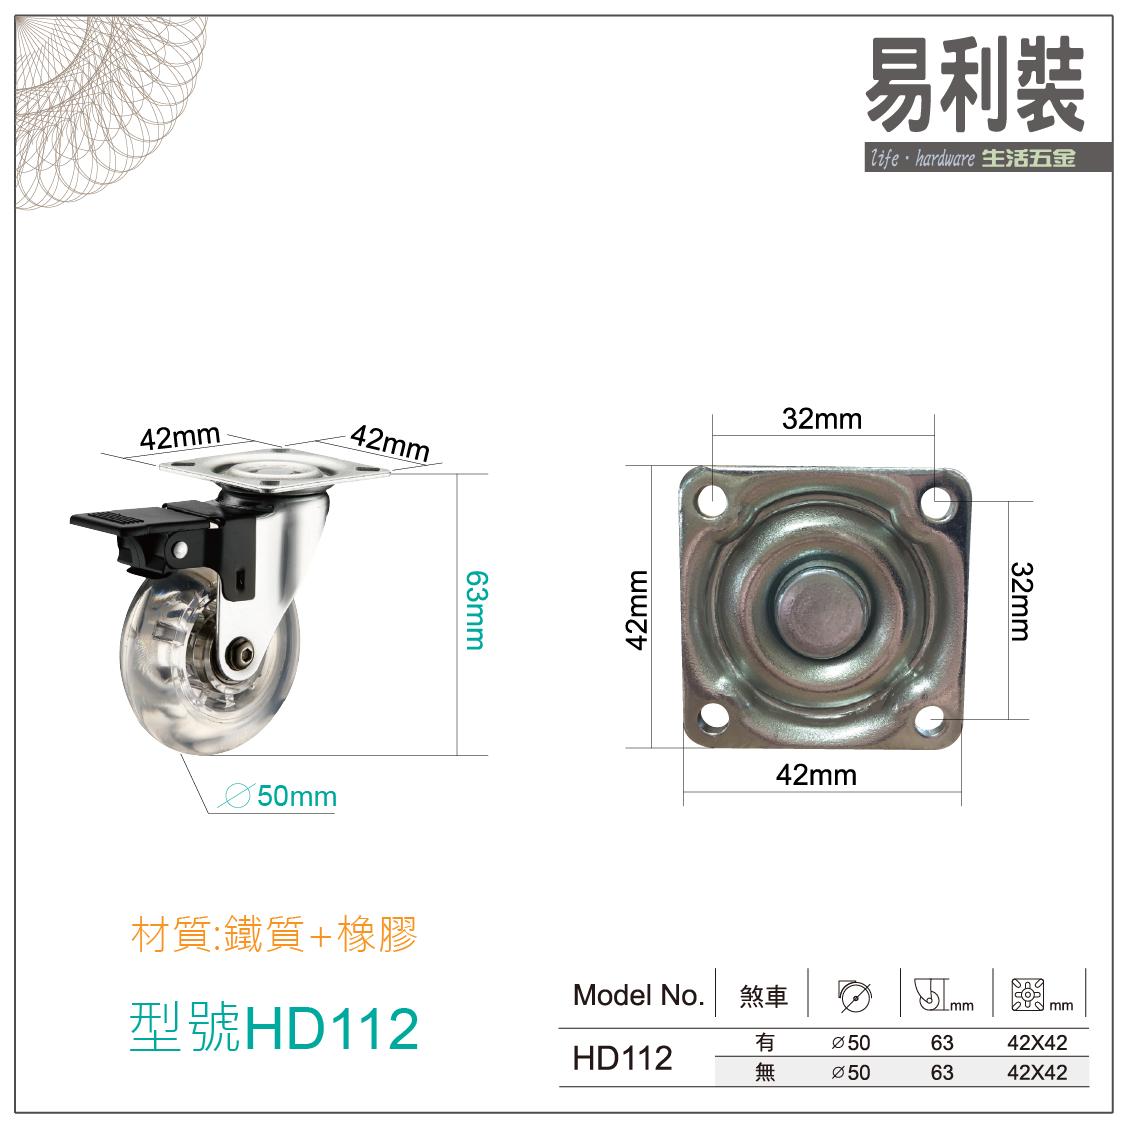 【 EASYCAN  】HD112-113 活動輪 易利裝生活五金 桌輪 櫃輪 房間 臥房 衣櫃 小資族 辦公家具 系統家具 2